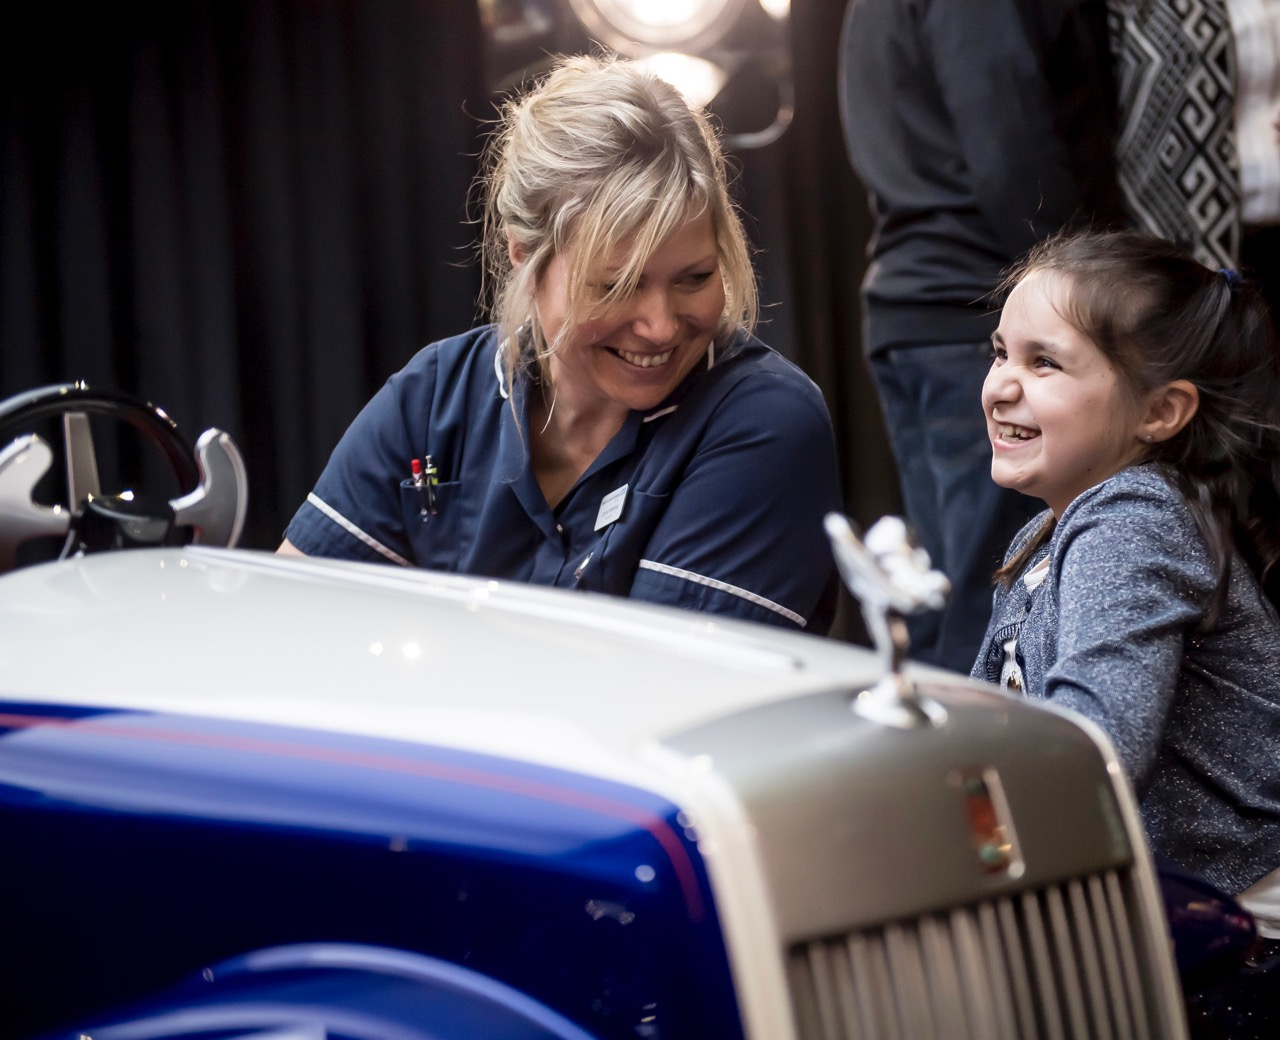 Rolls-Royce staffer introduces Molly Matthews to the SRH